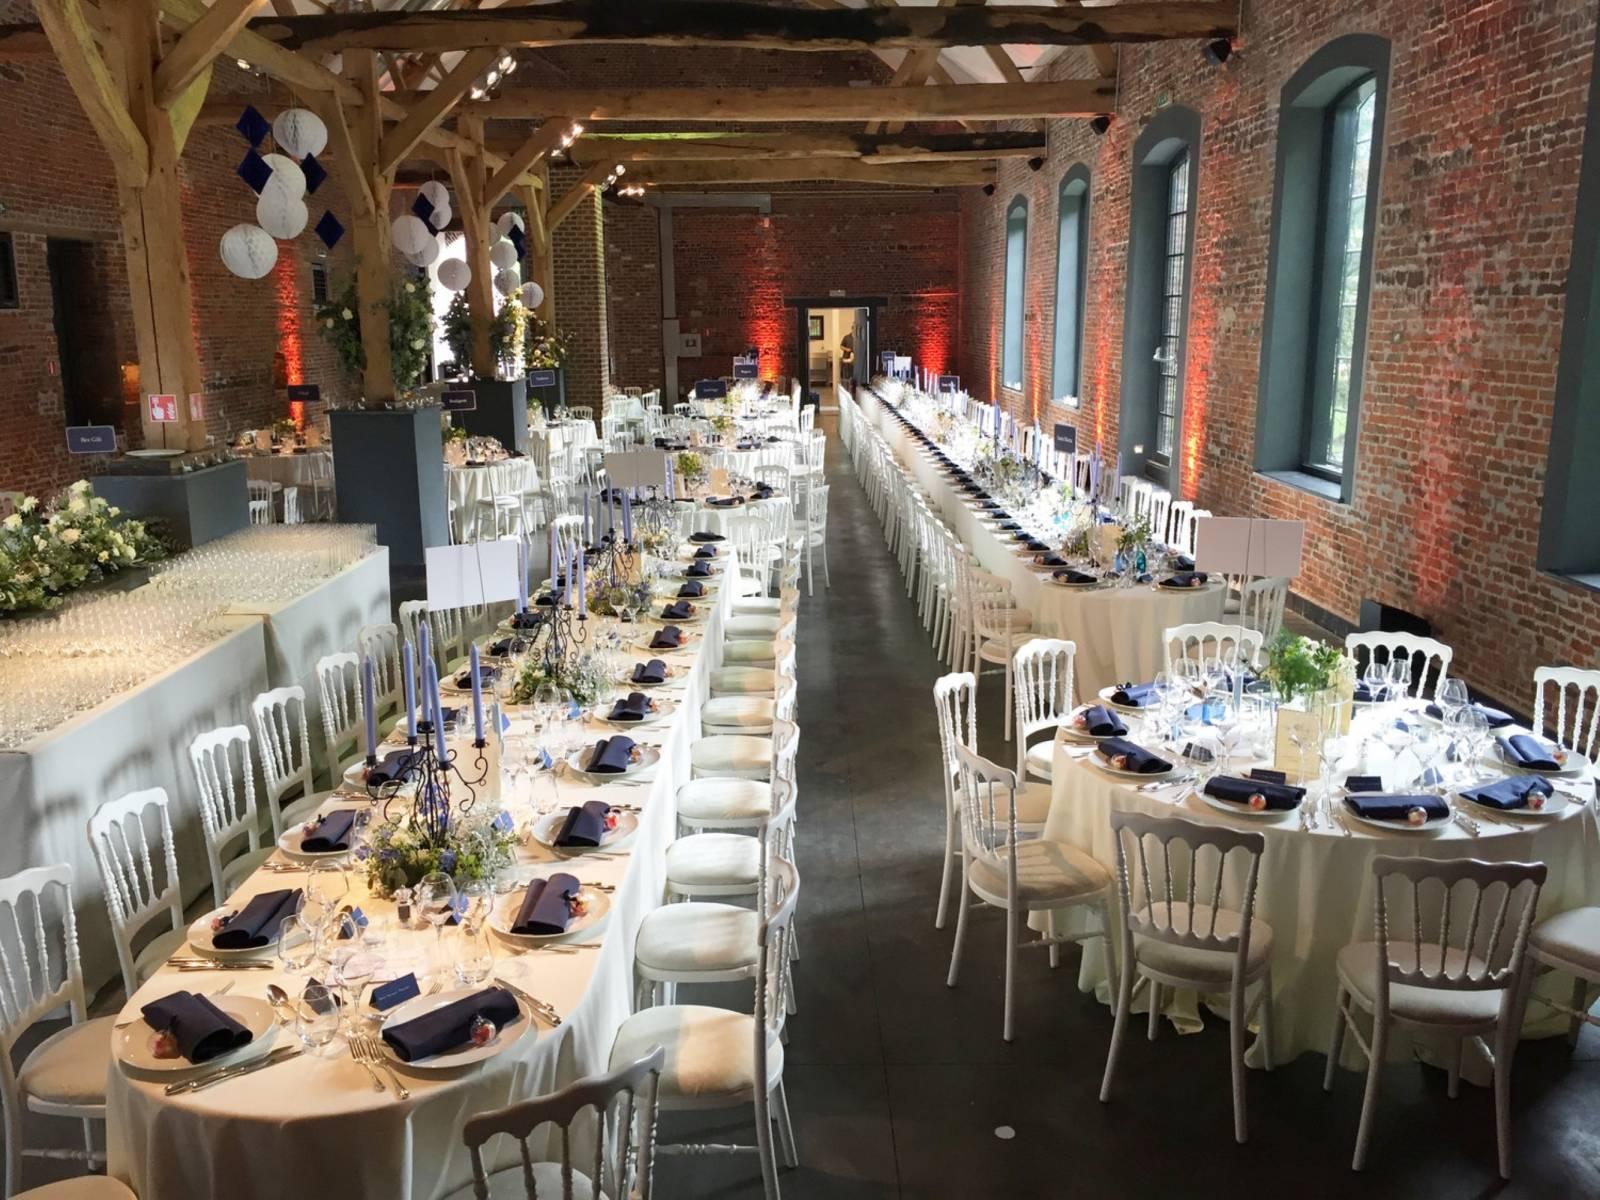 La ferme de Balingue House of Weddings feestzaal salle de fete lieu exceptionnel huwelijk mariage trouwen trouwzaal Brusse (26)